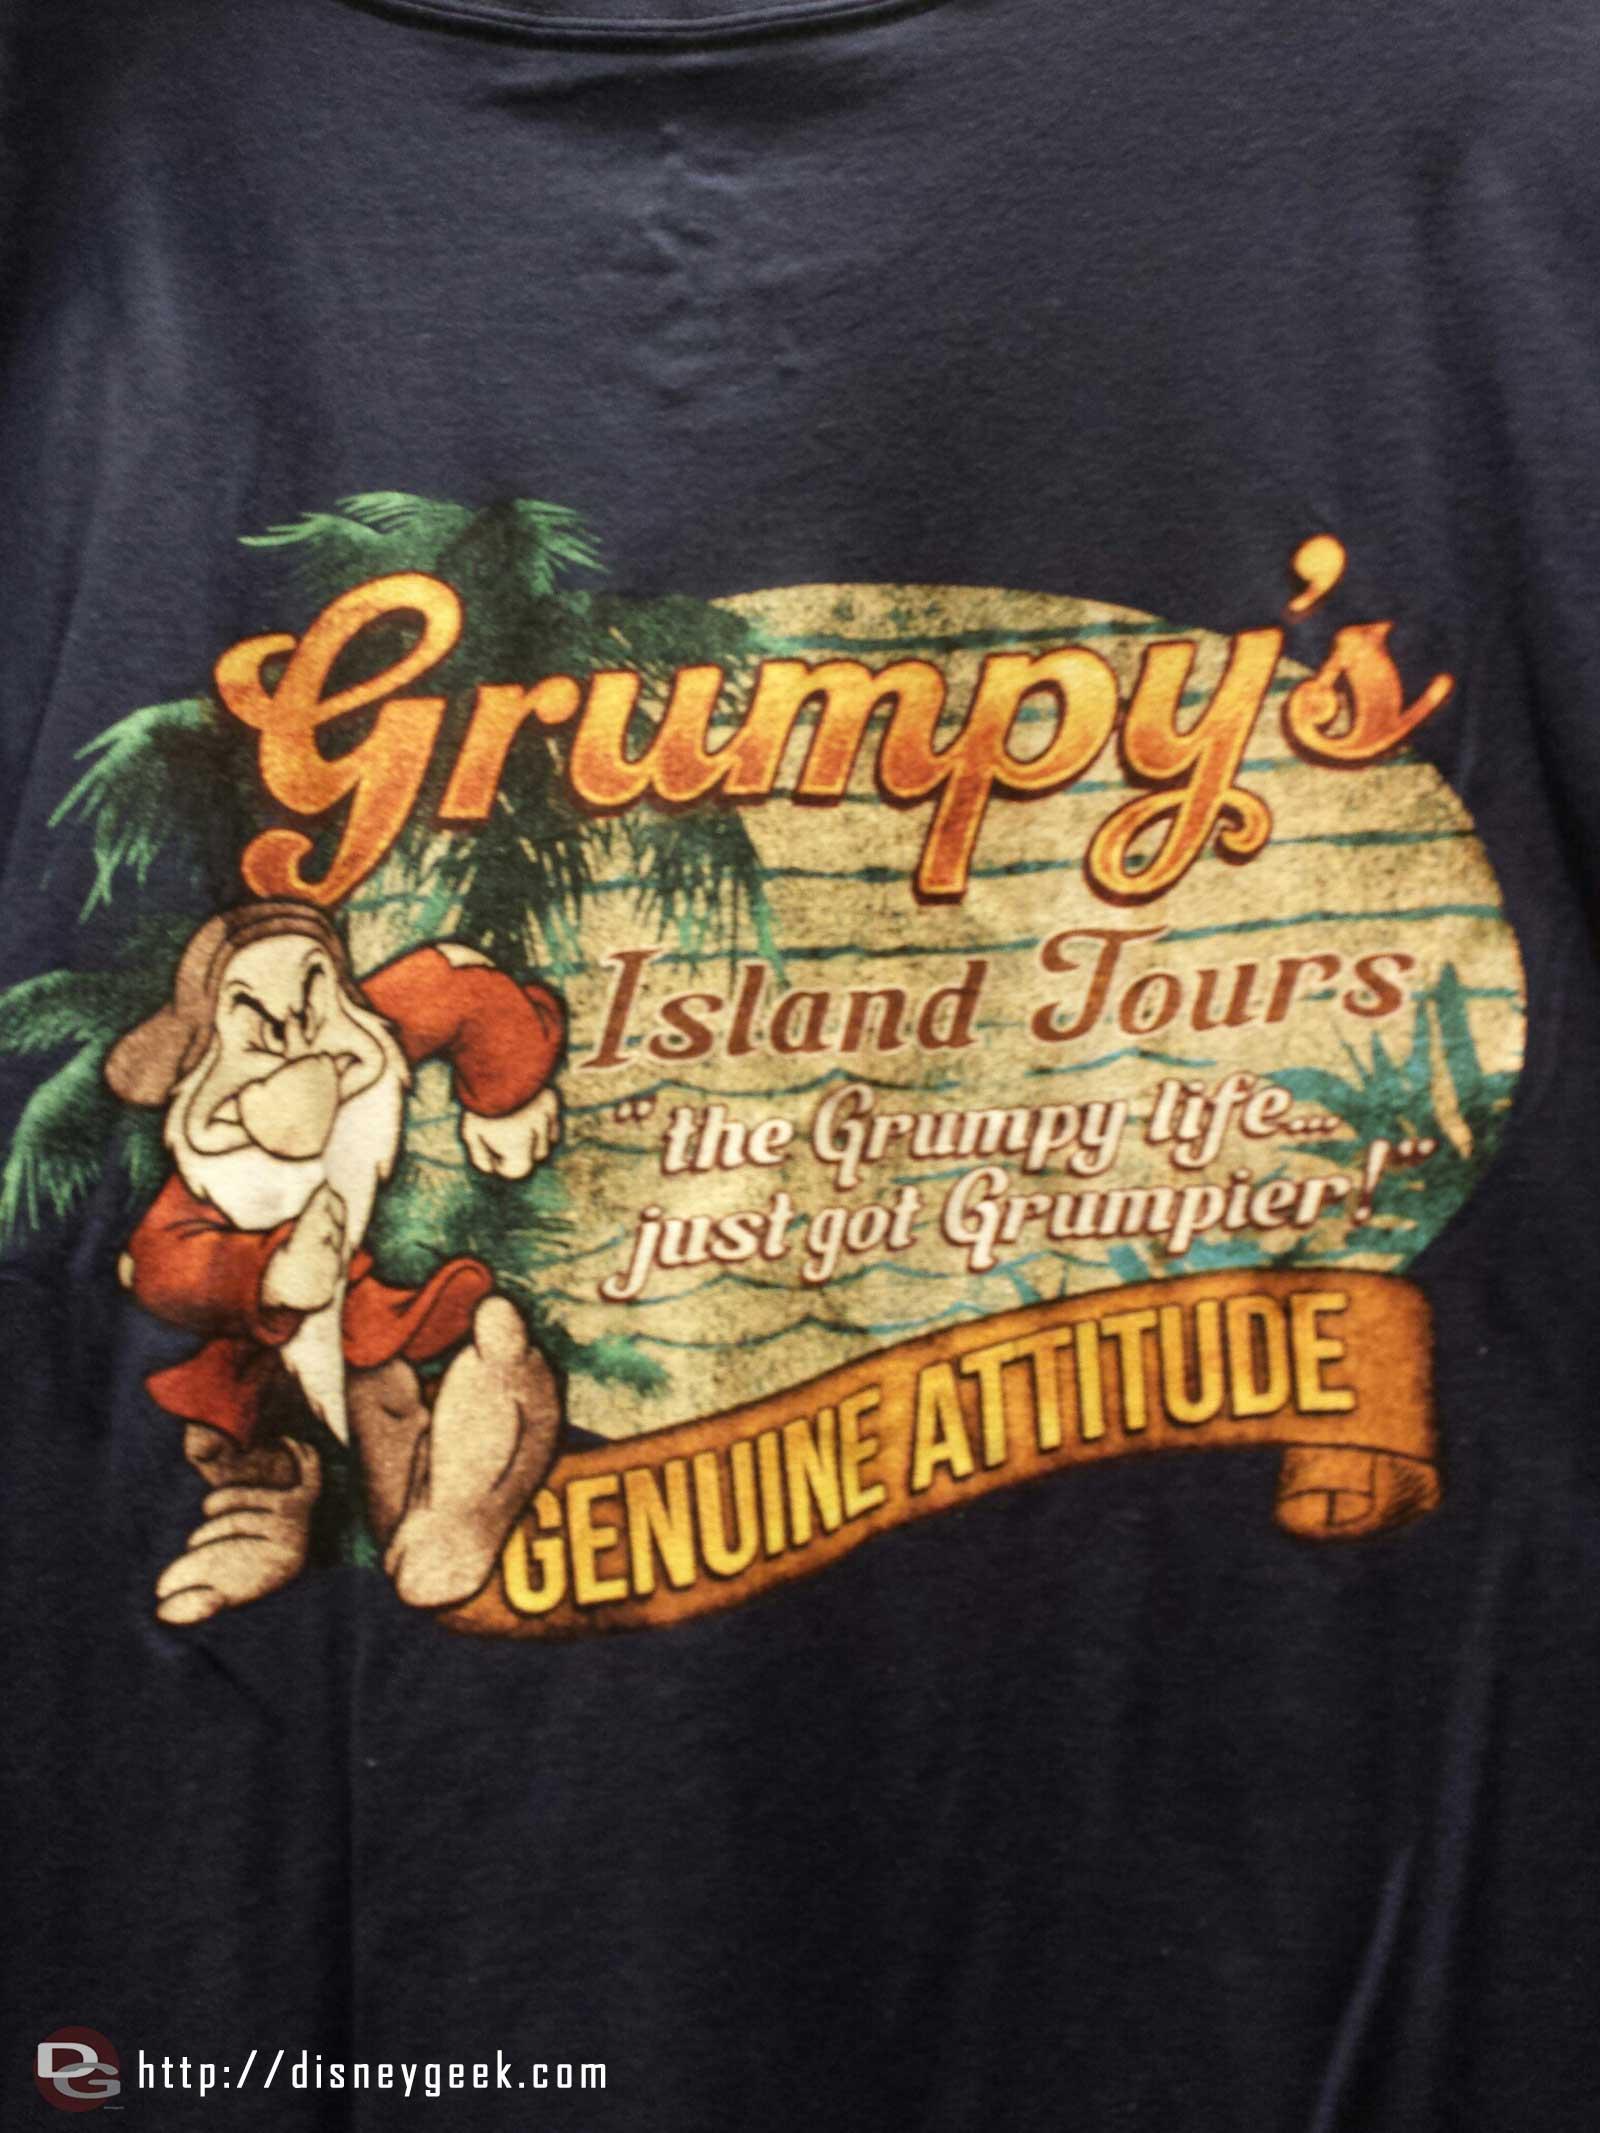 Grumpy's Island Tours T-shirt